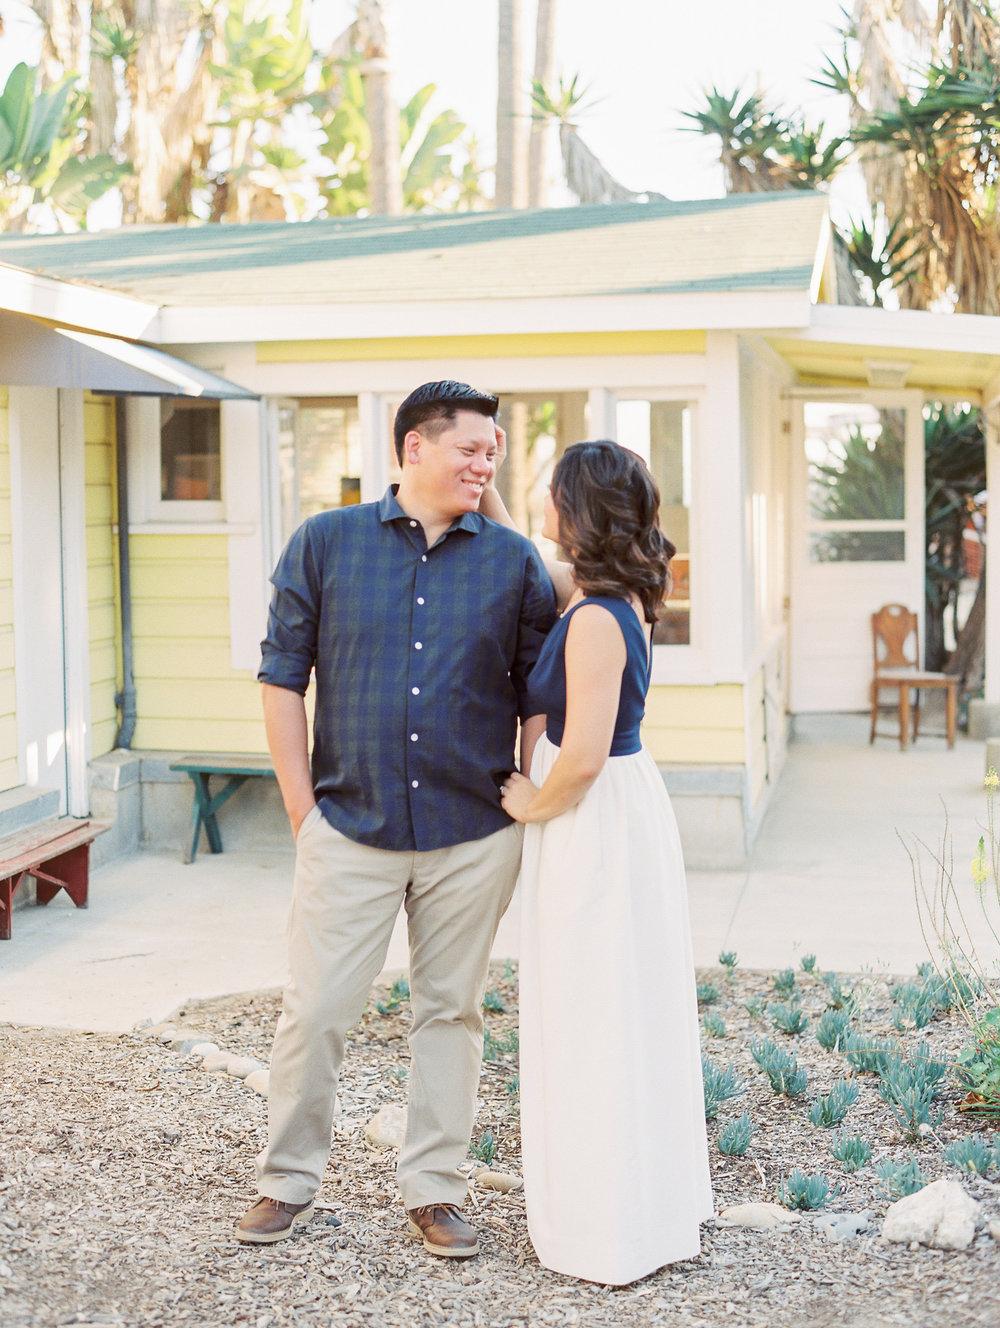 Crystal-Cove-Engagement-Kristina-Adams-9.jpg